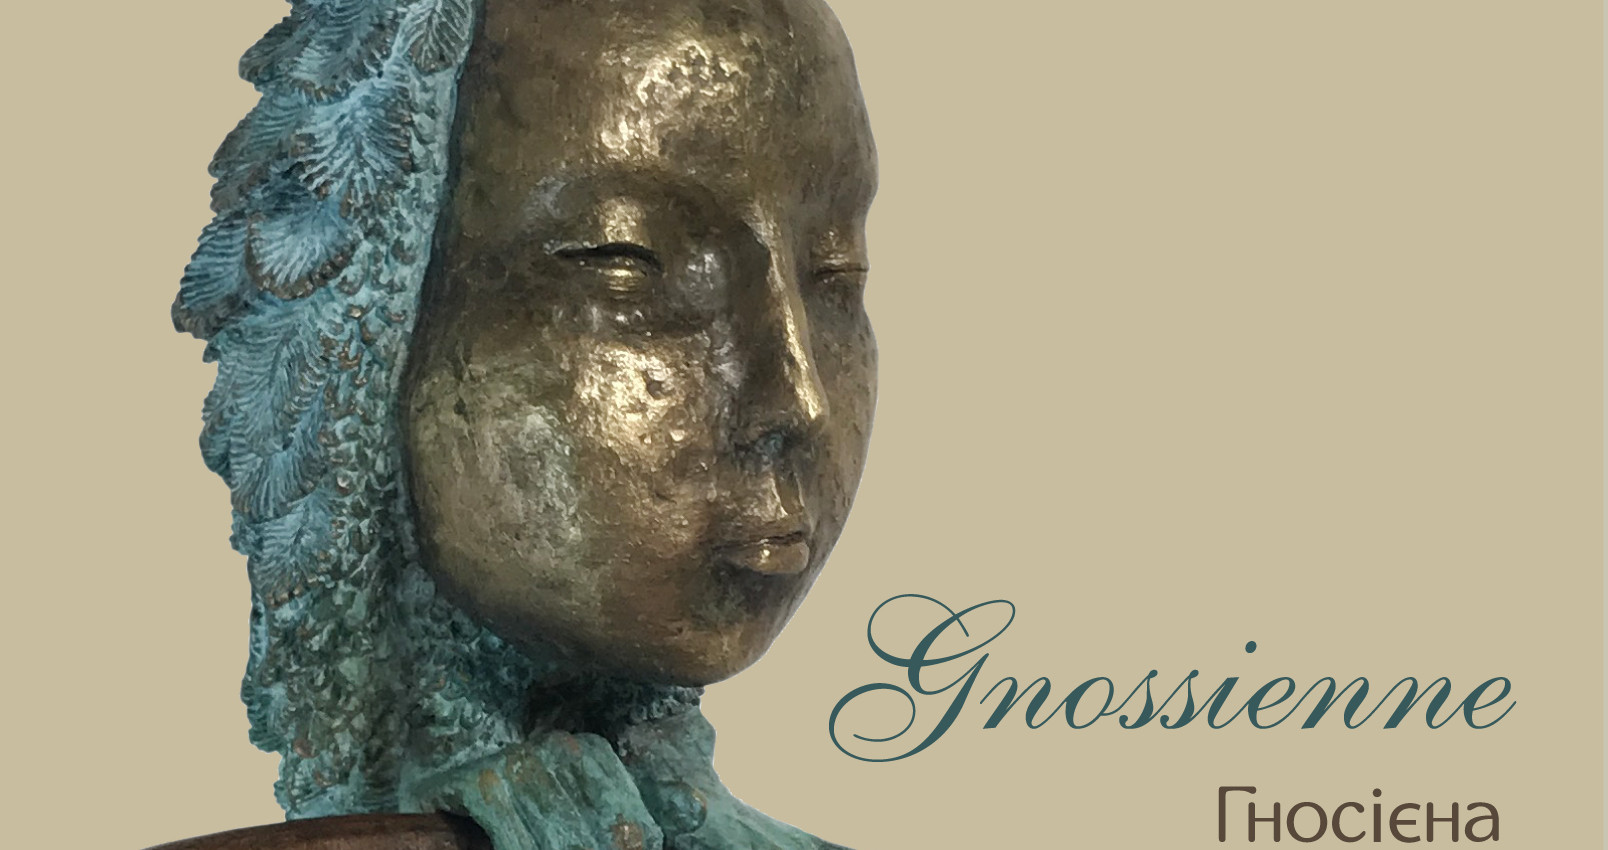 GNOSSIENNE project by Alina Bachurina and Zhenia Shane